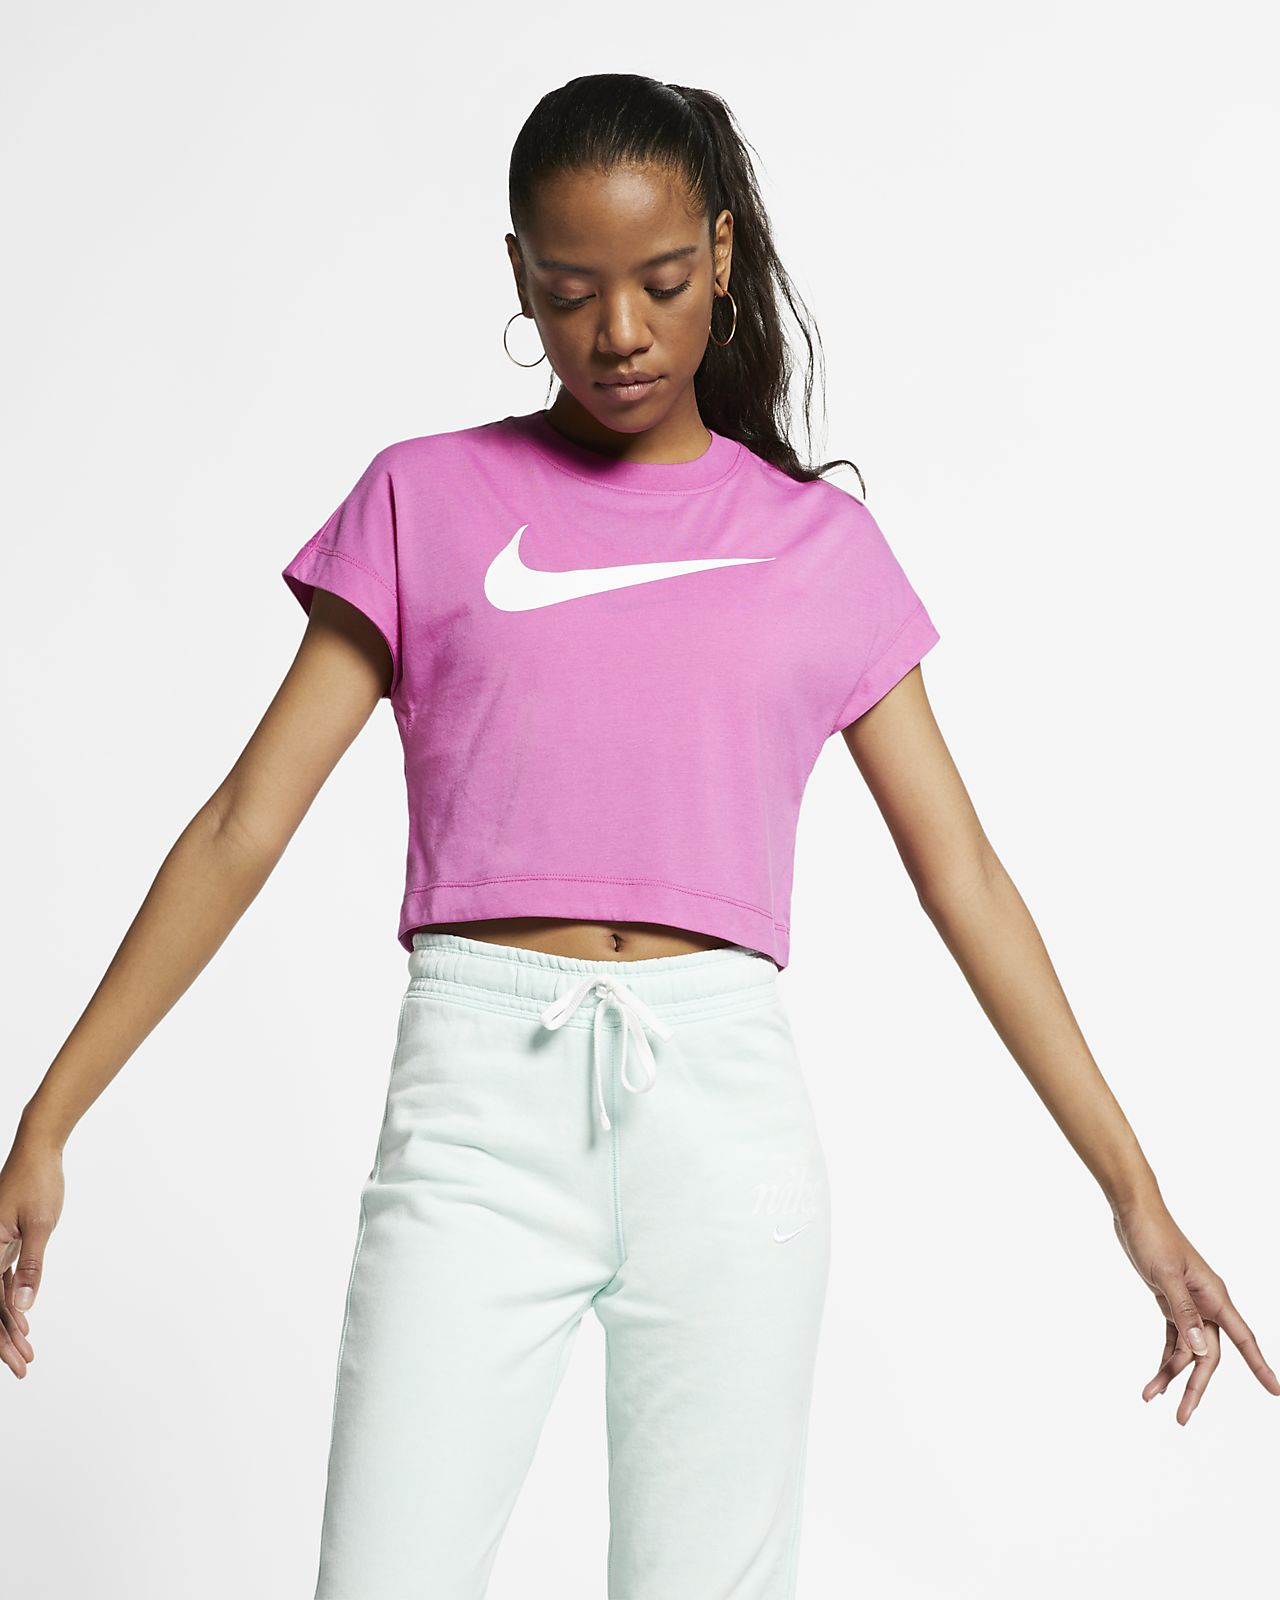 c808c4432987a Nike Sportswear kurzärmliges Crop Top mit Swoosh für Damen. Nike.com DE